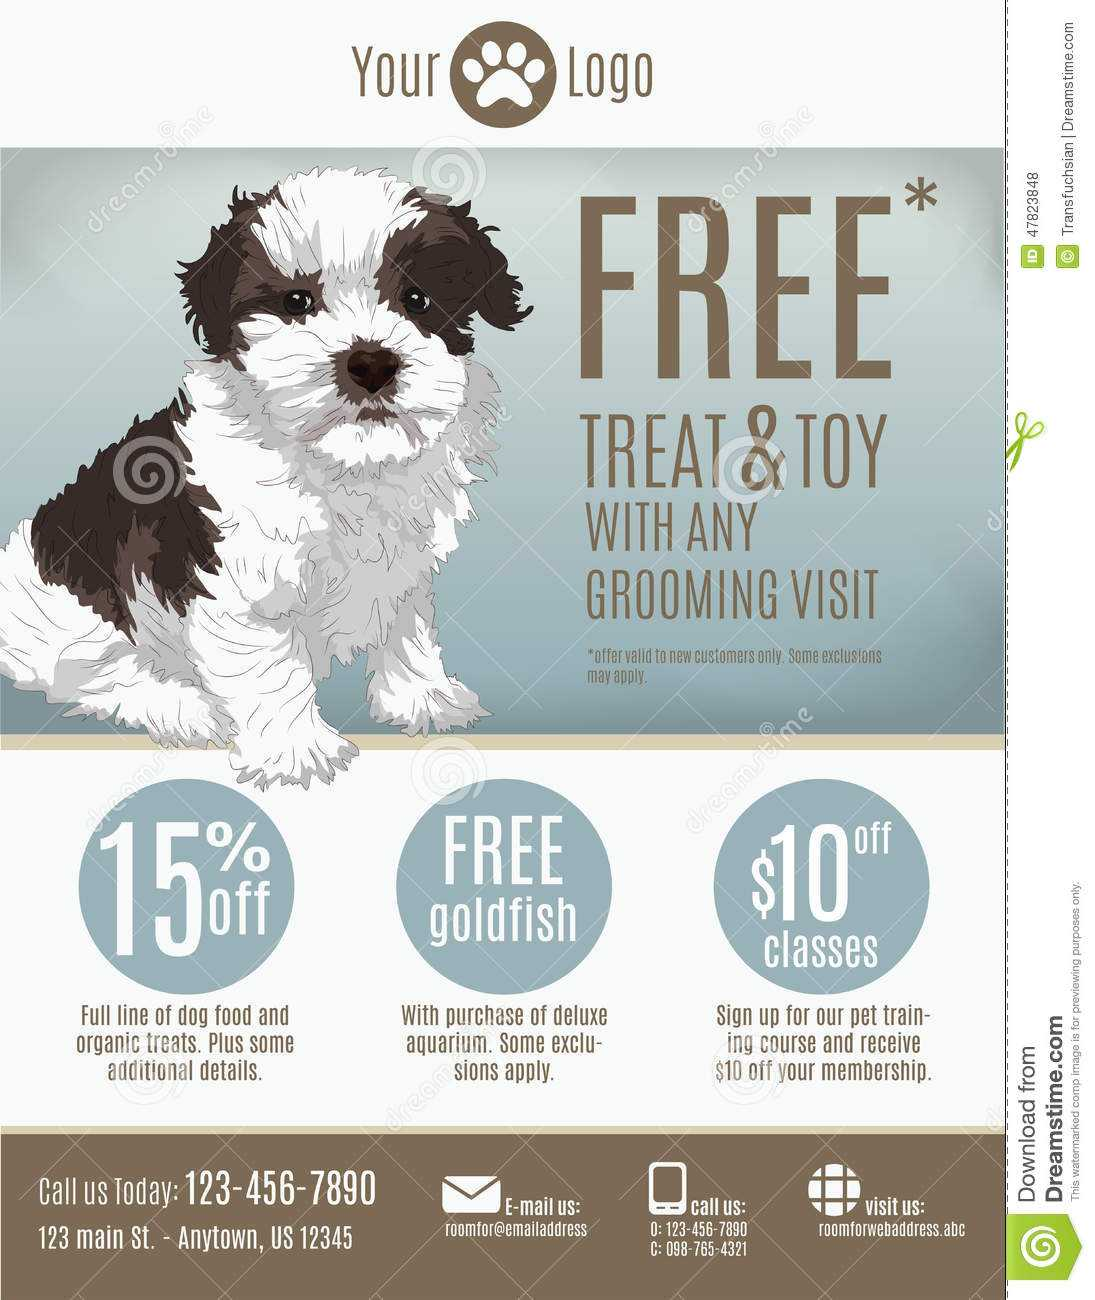 Dog Sale Flyer Template - Tunu.redmini.co Inside Dog Walking Flyer Template